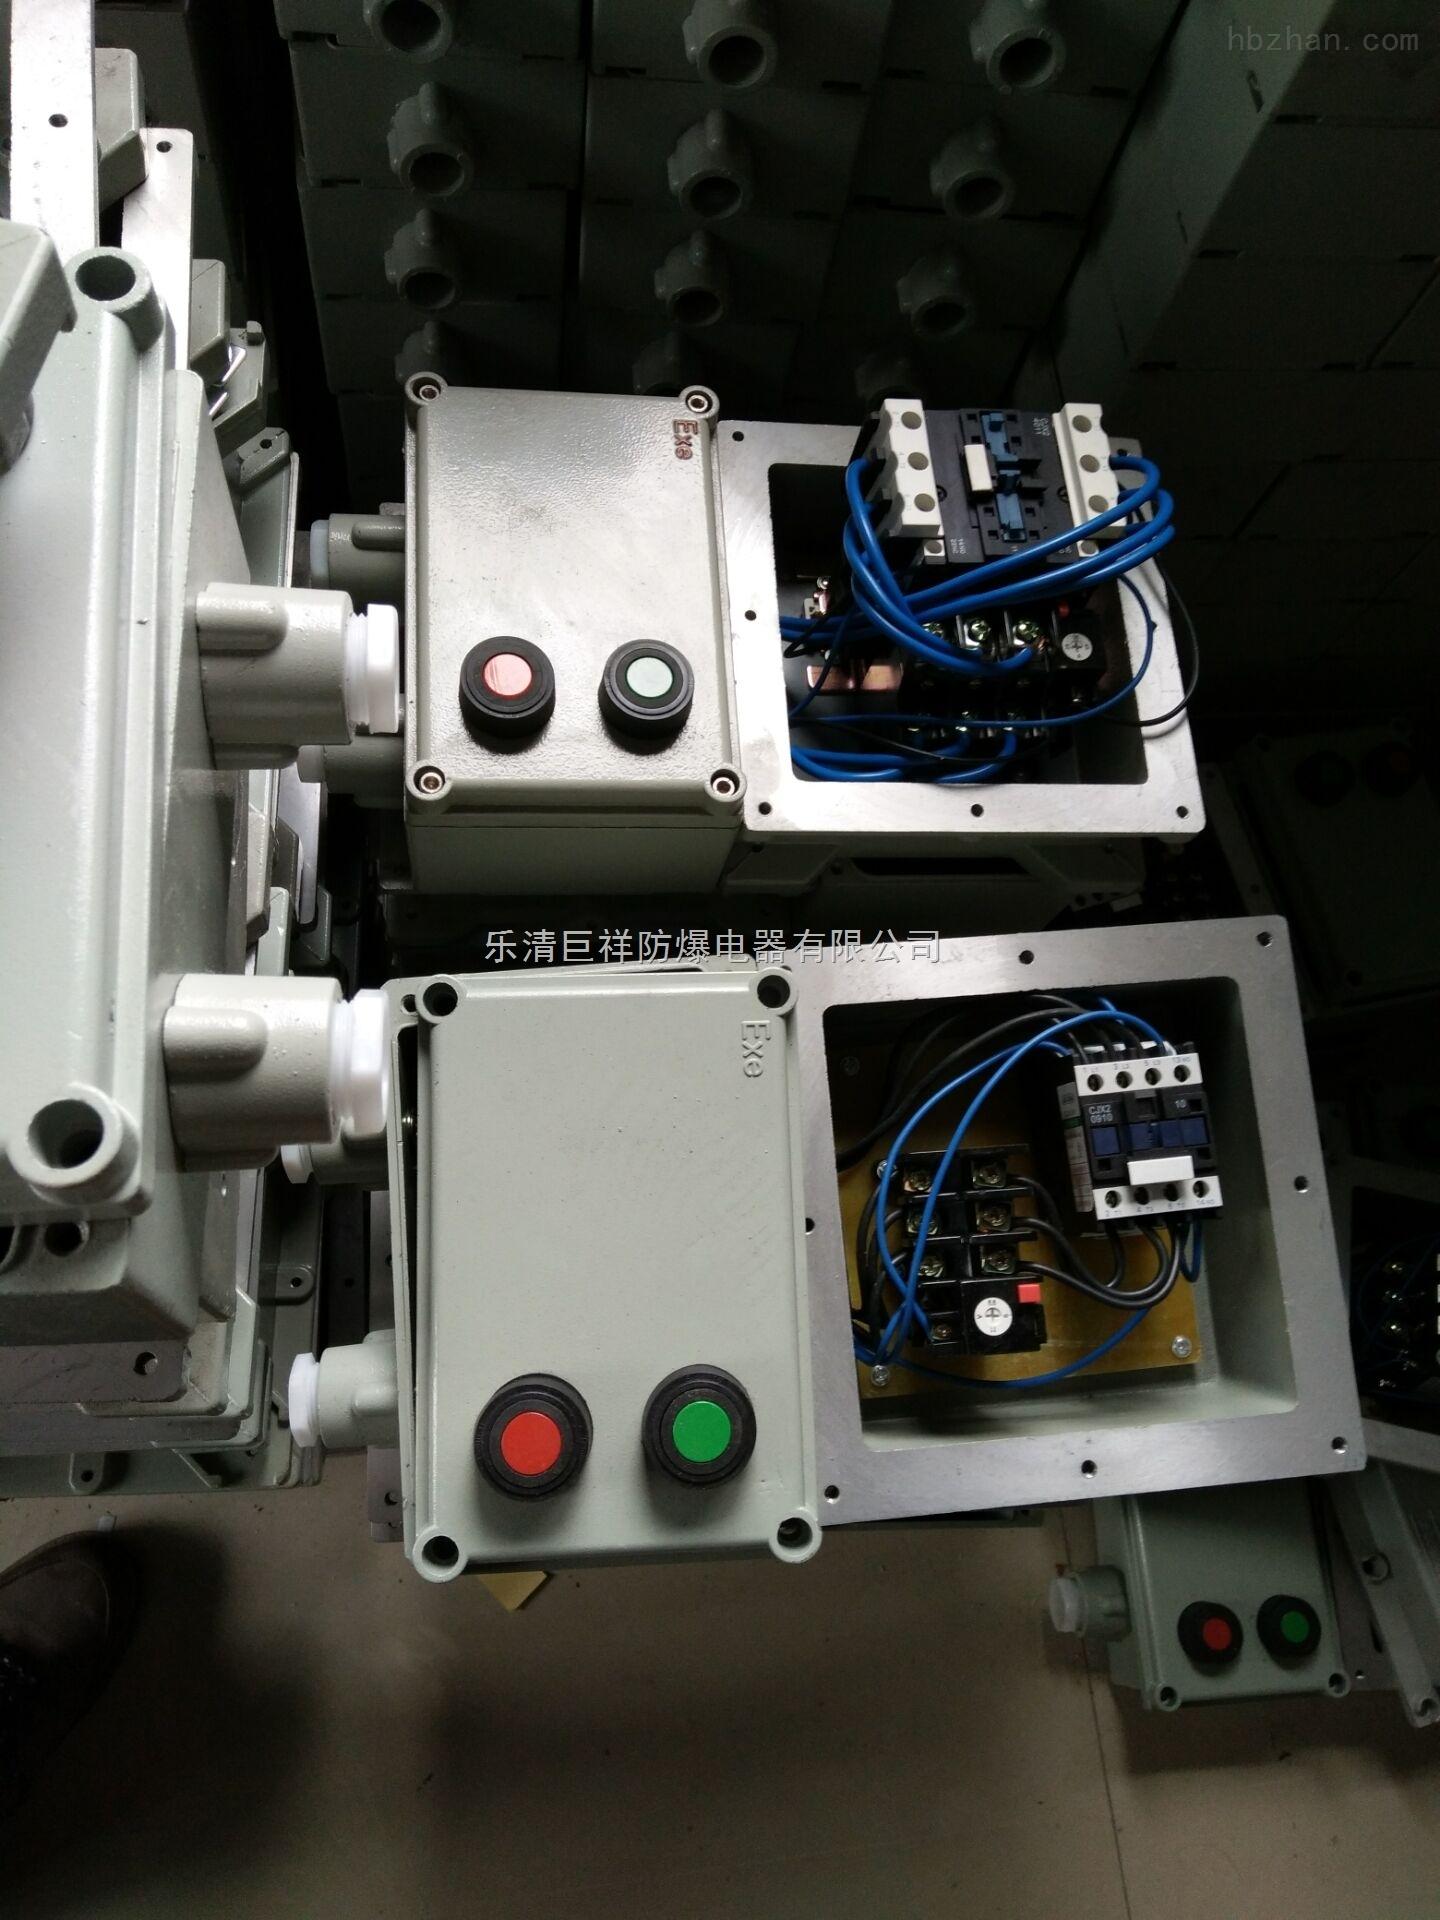 bqd-40 bqd-40防爆启动器bcd-20a防爆磁力启动器